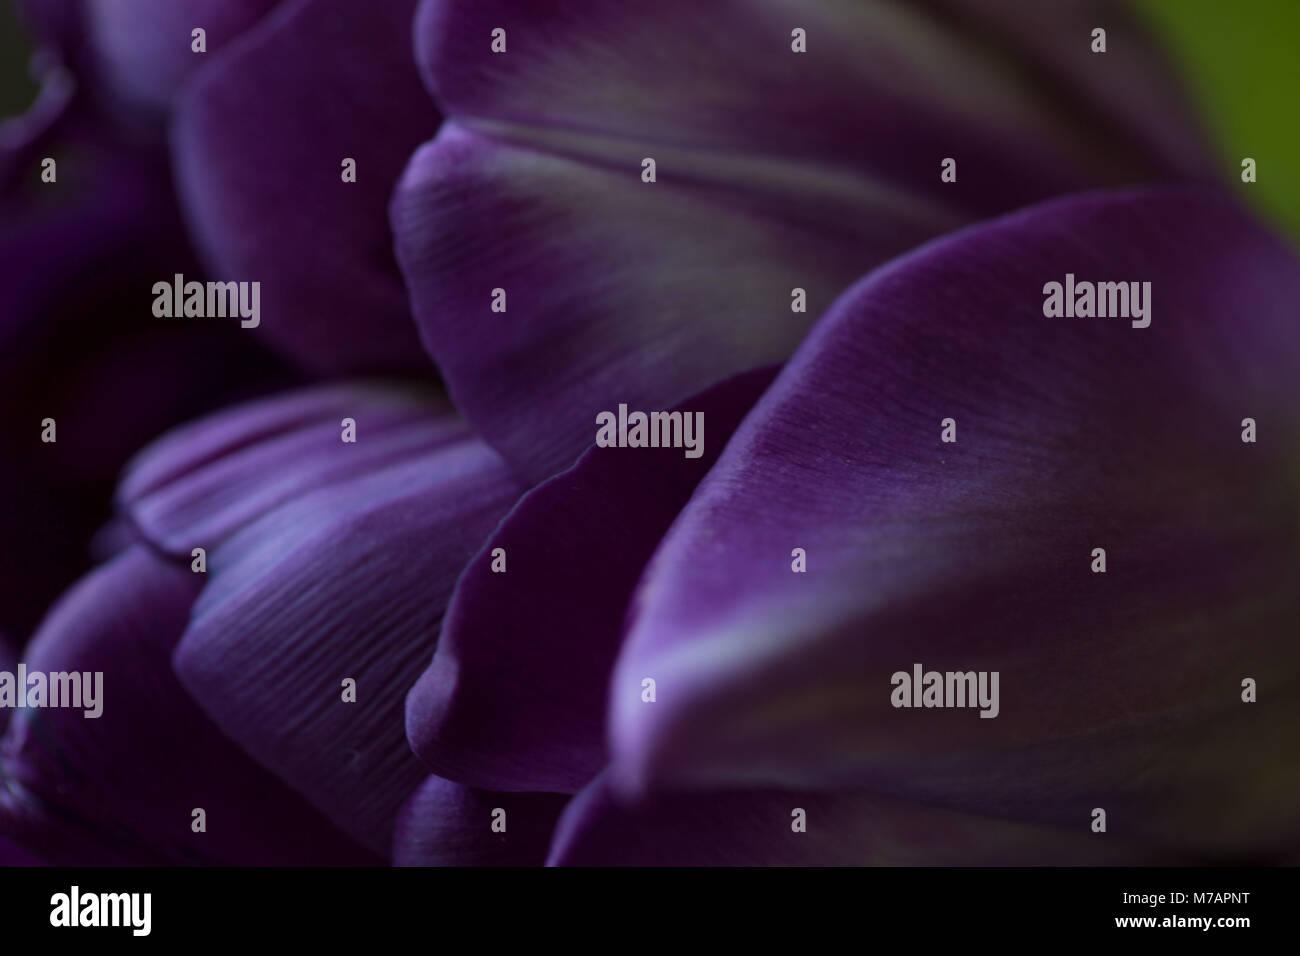 Close-up of ultraviolet tulip petals - Stock Image